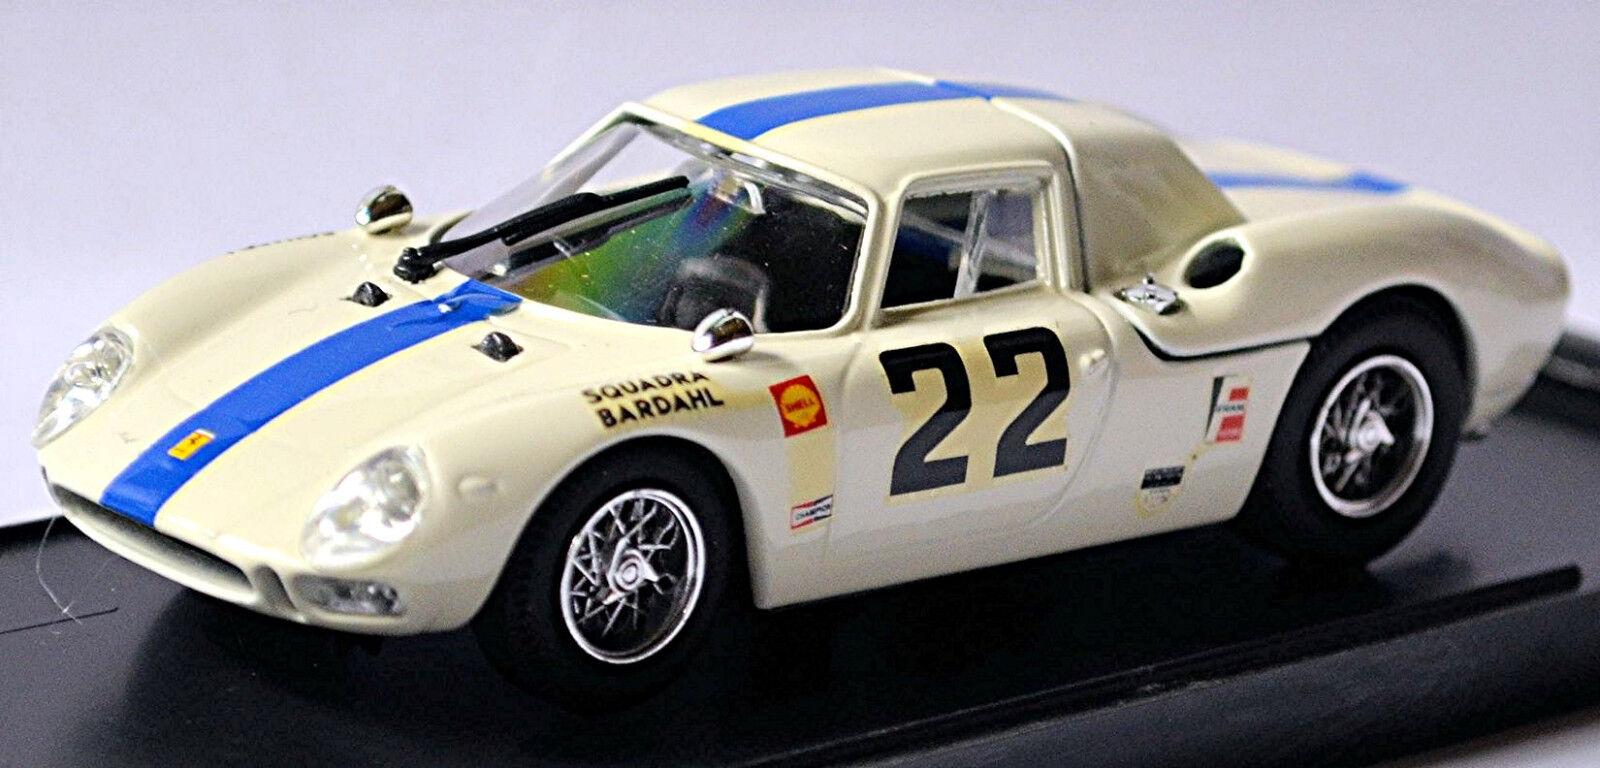 FERRARI 275 LM - MONZA 1966 BIANCO 1 43 MIGLIORI